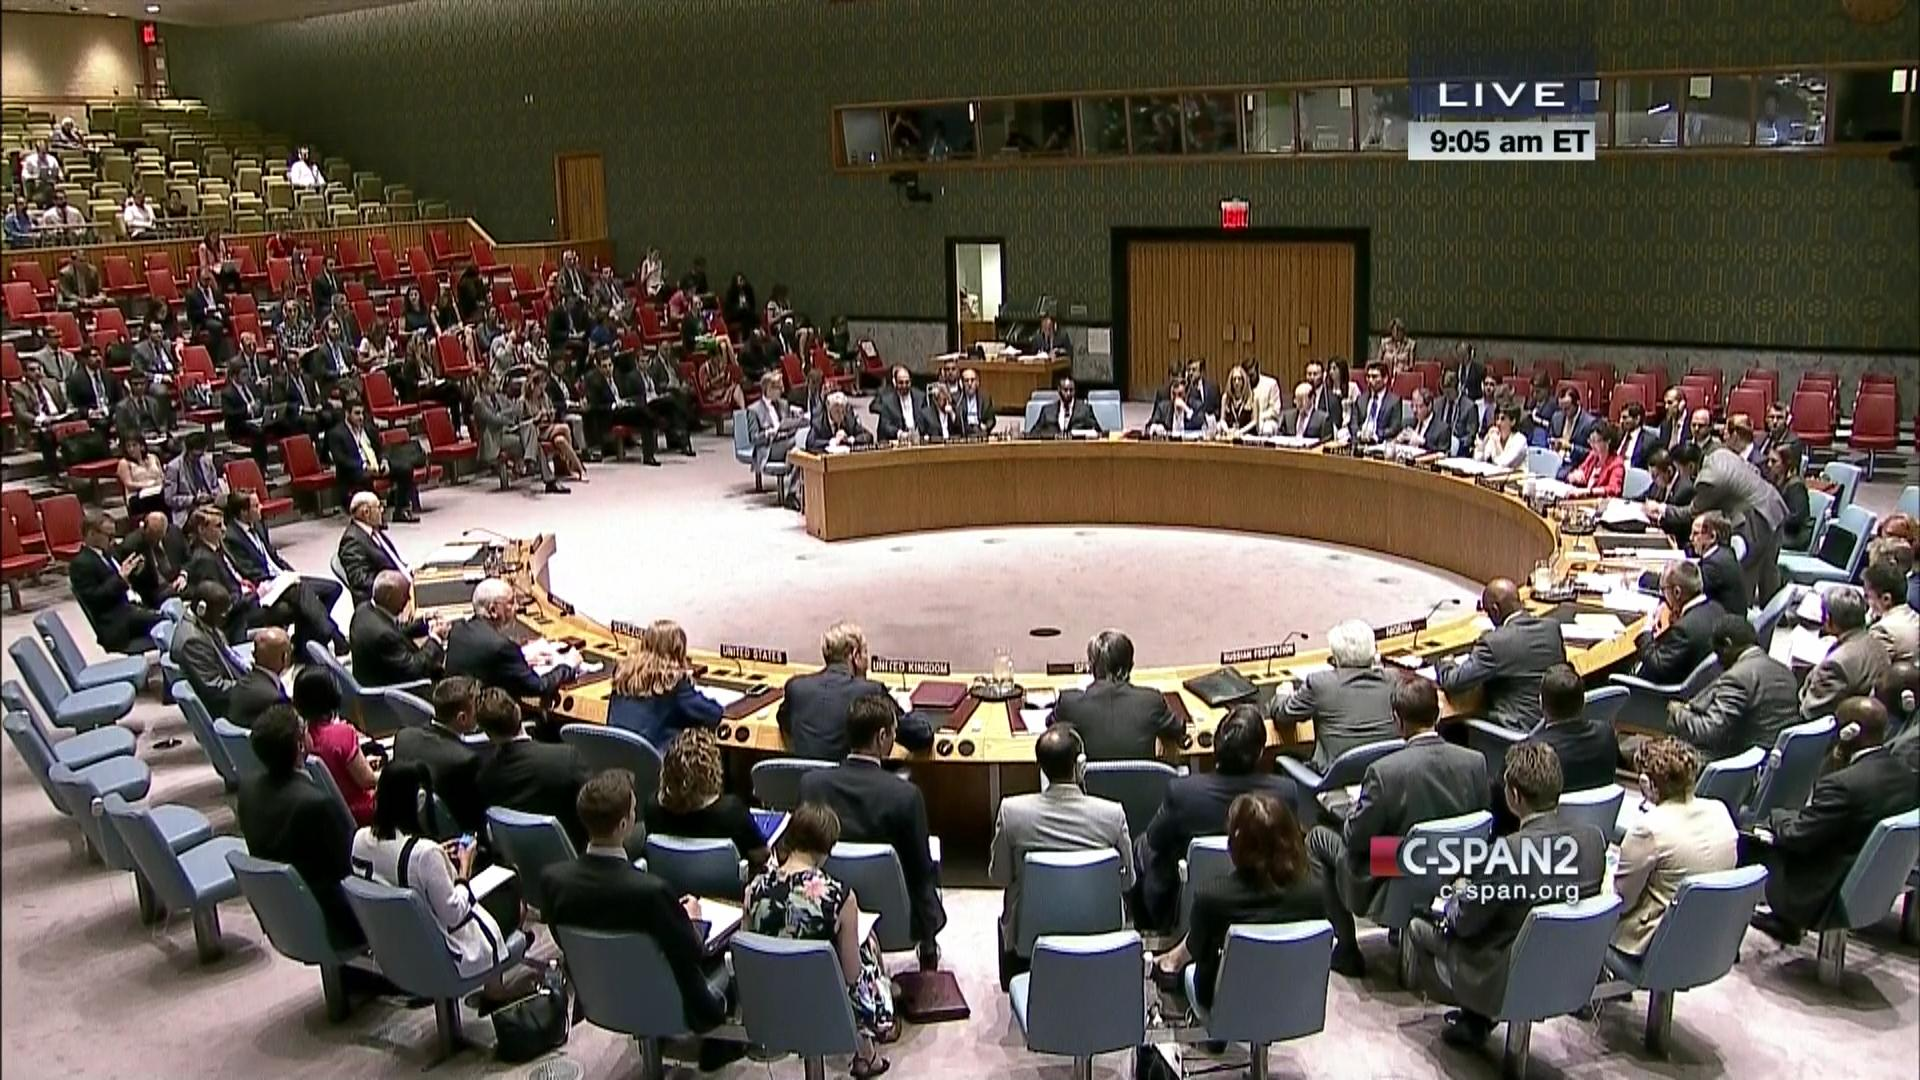 Russia implores UN Security Council to apply dialogue